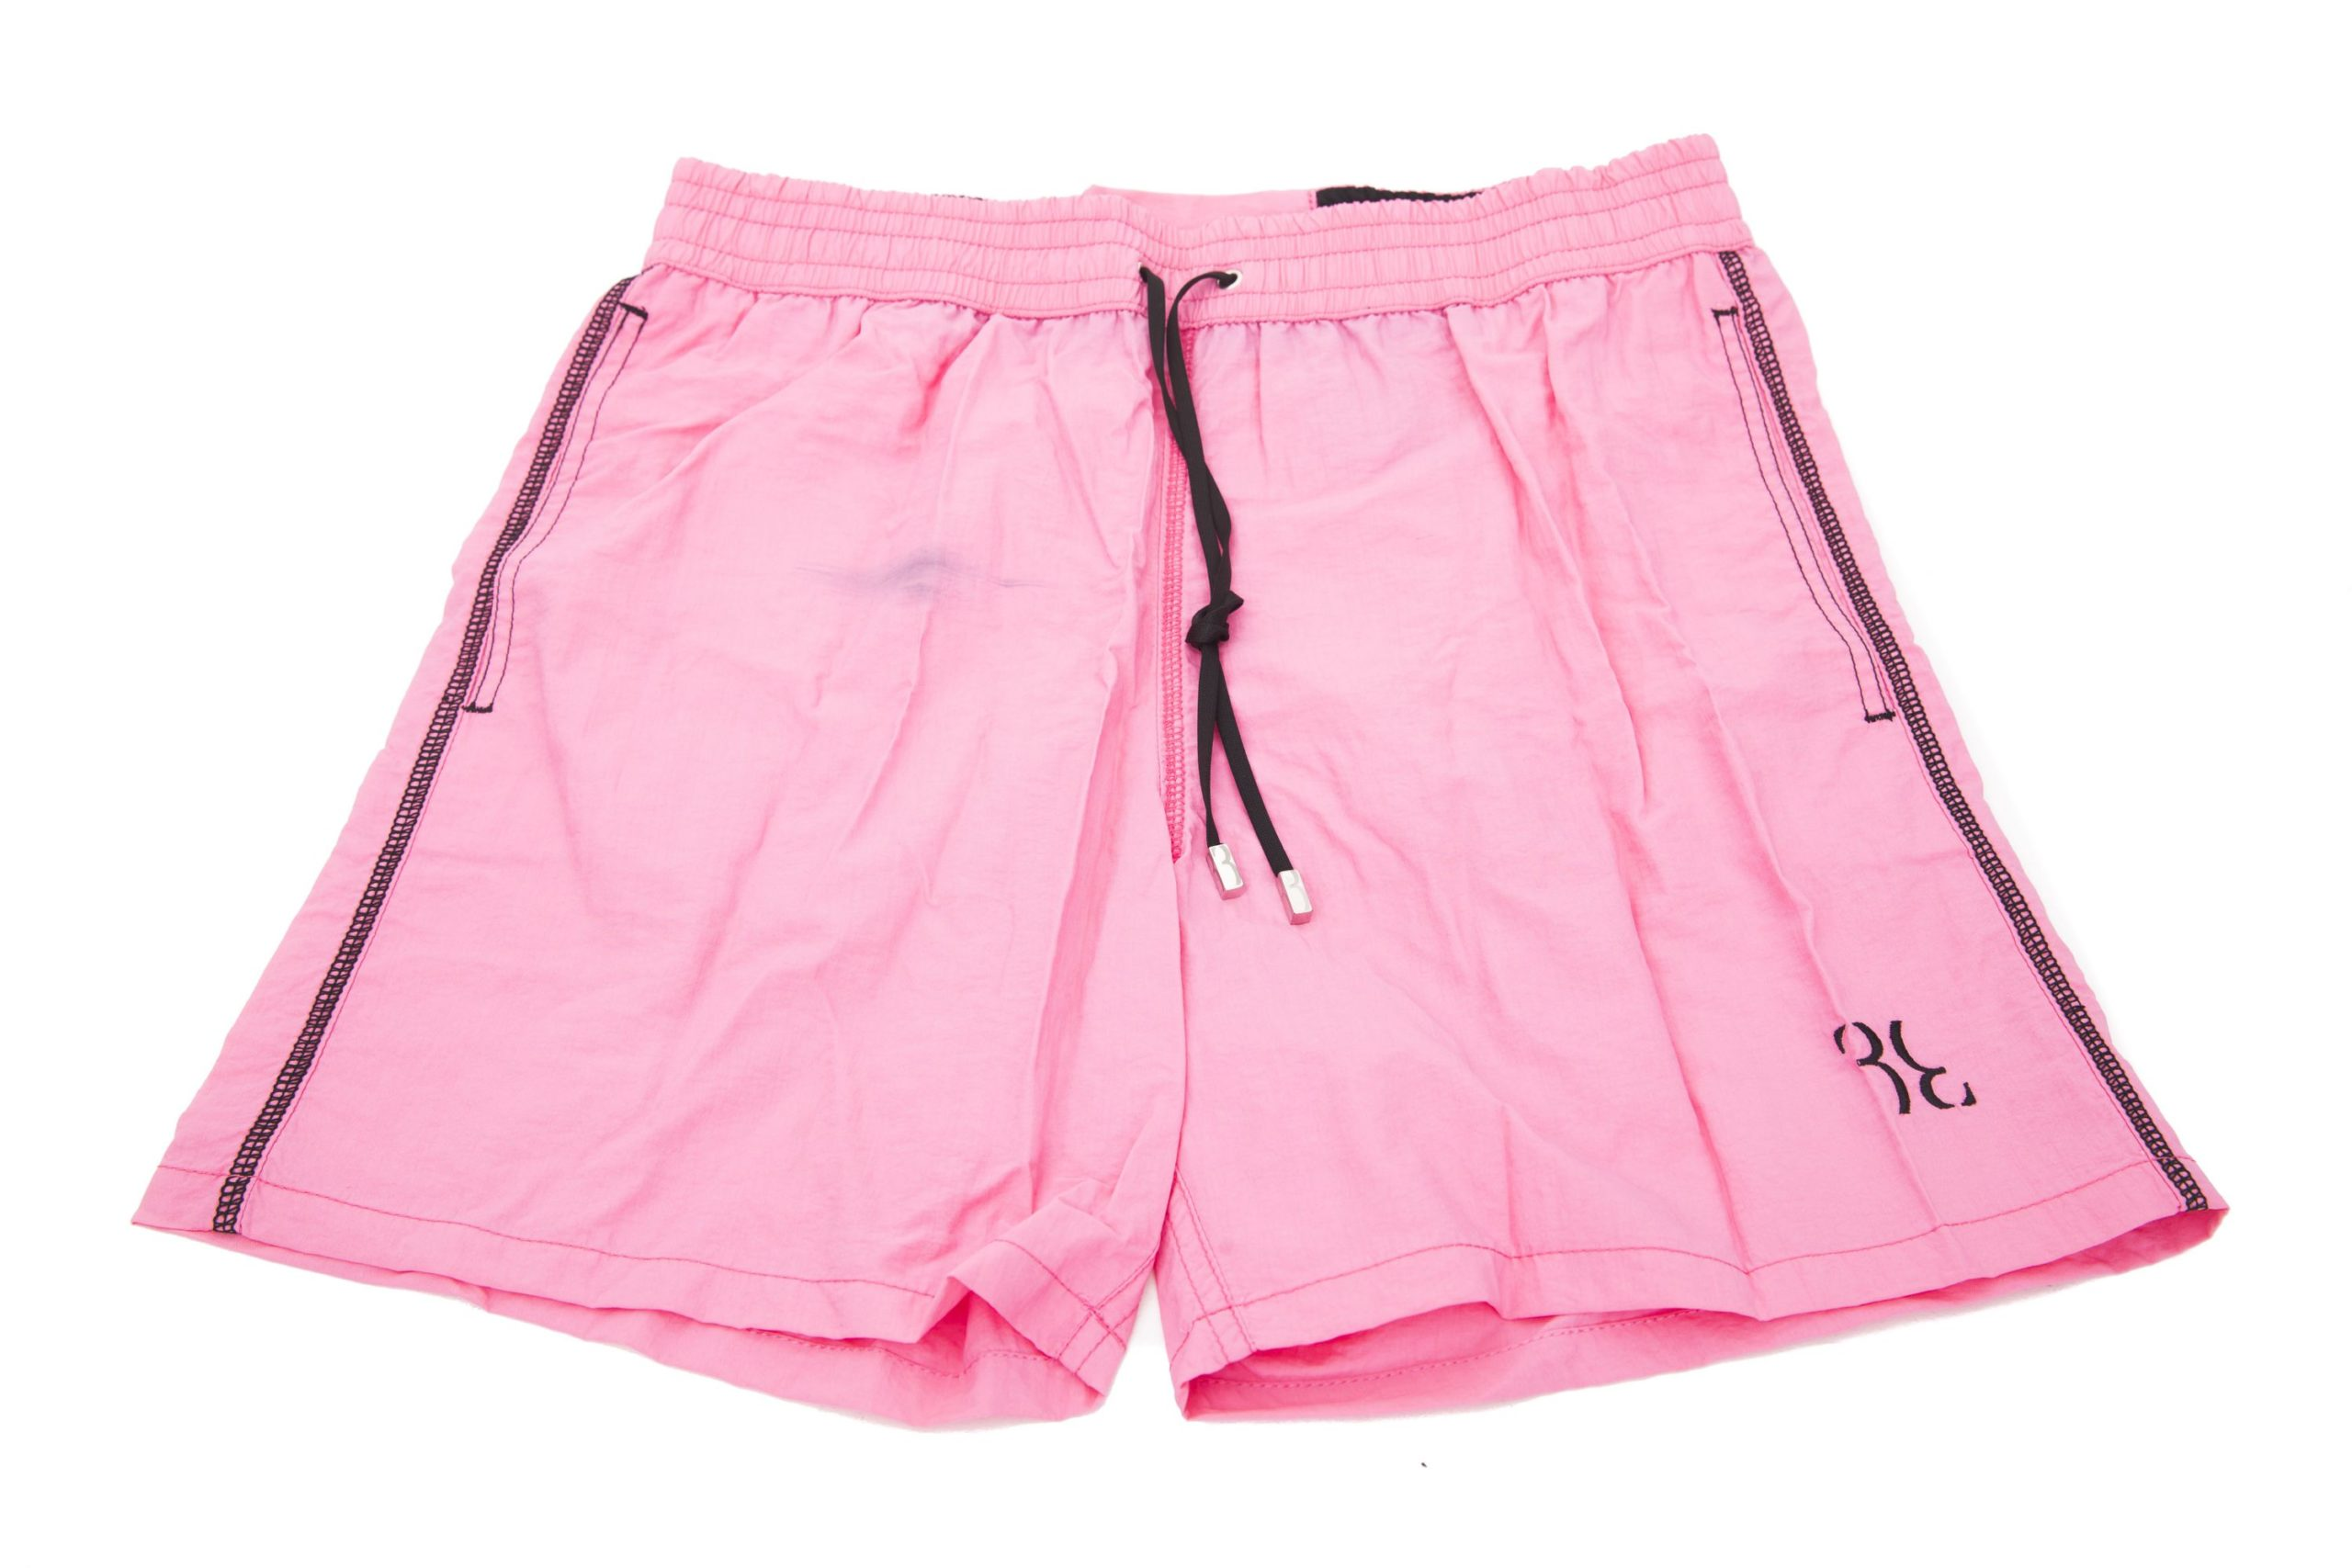 Billionaire Italian Couture Men's Swimwear Pink BI823175 - IT52   L